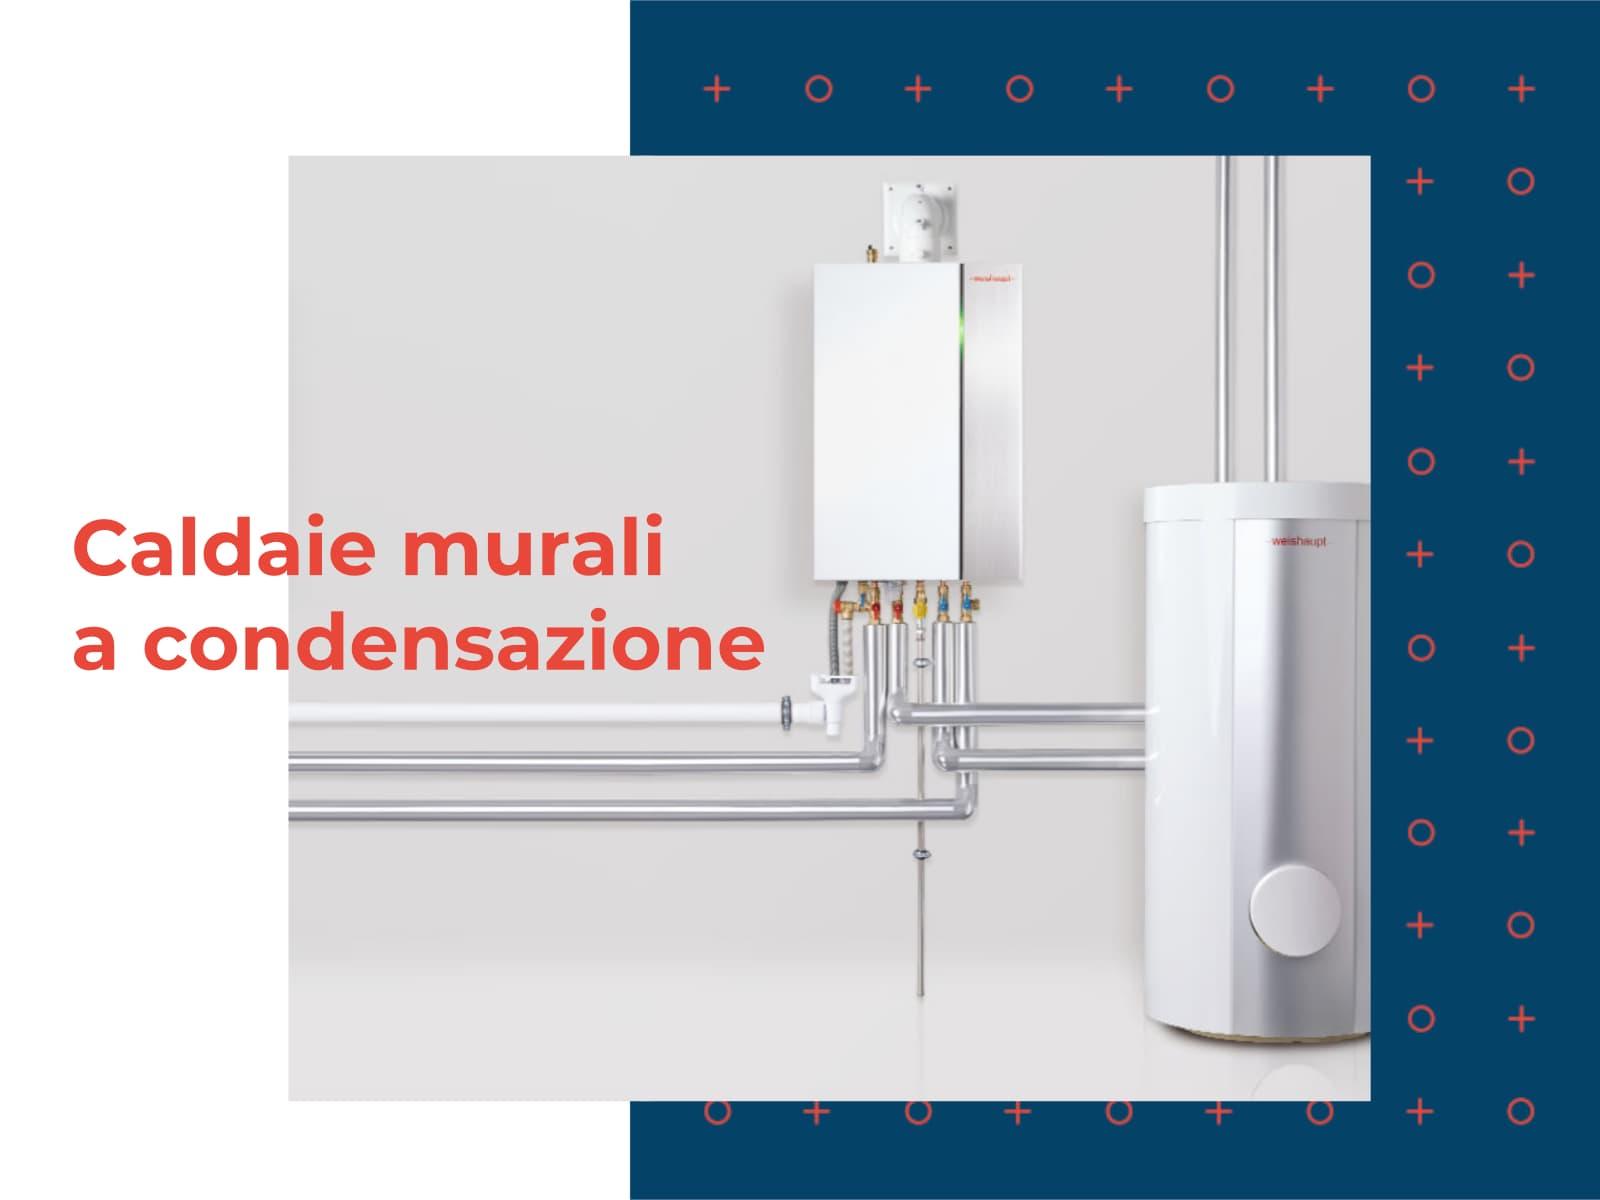 You are currently viewing Nuove caldaie murali Weishaupt per centrali termiche a condensazione.